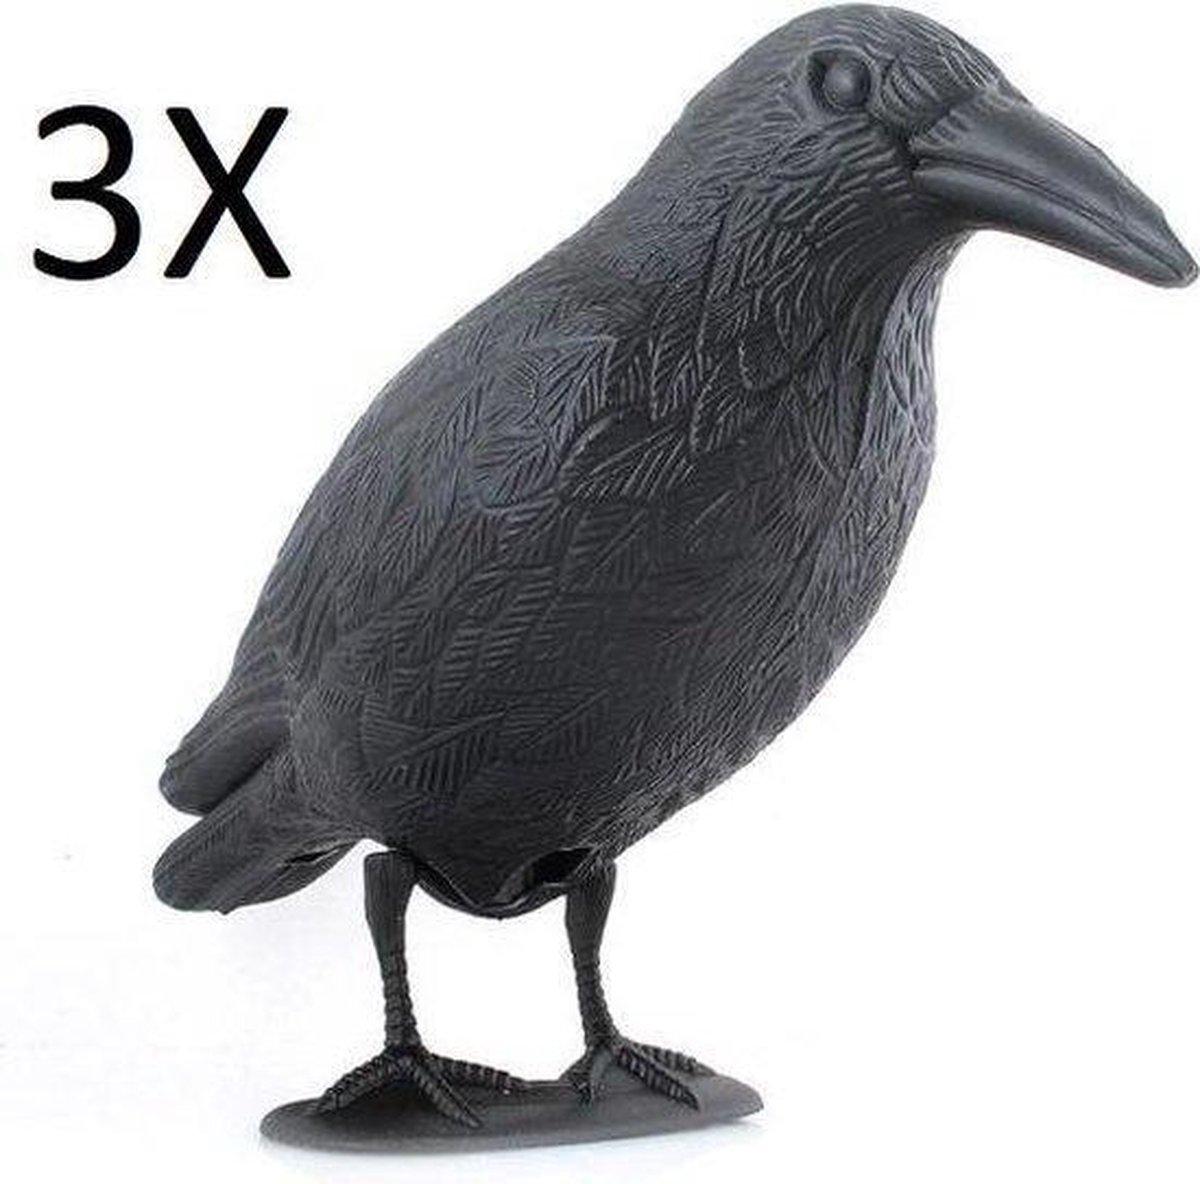 3x XL Duivenverjager